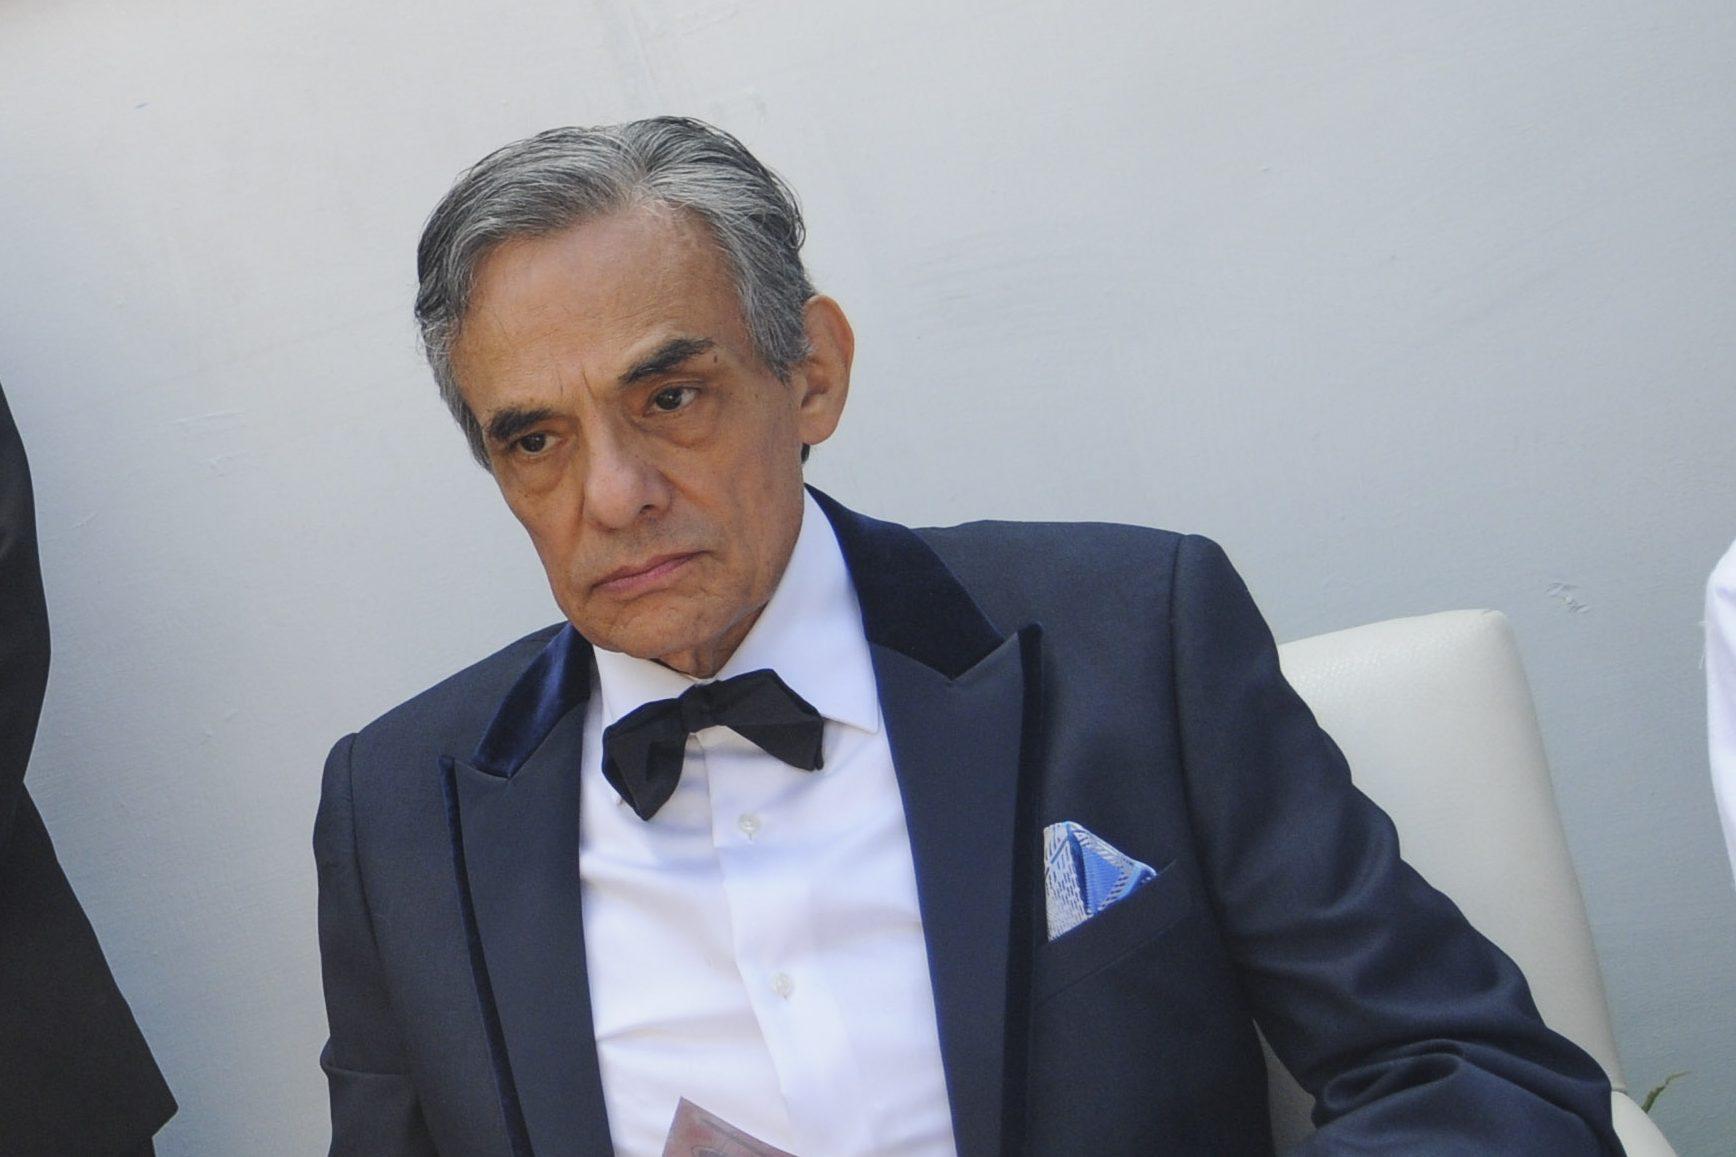 http://newsweekespanol.com/wp-content/uploads/2018/02/Homenaje_Jose769_Jose769-7-e1518022302488.jpg